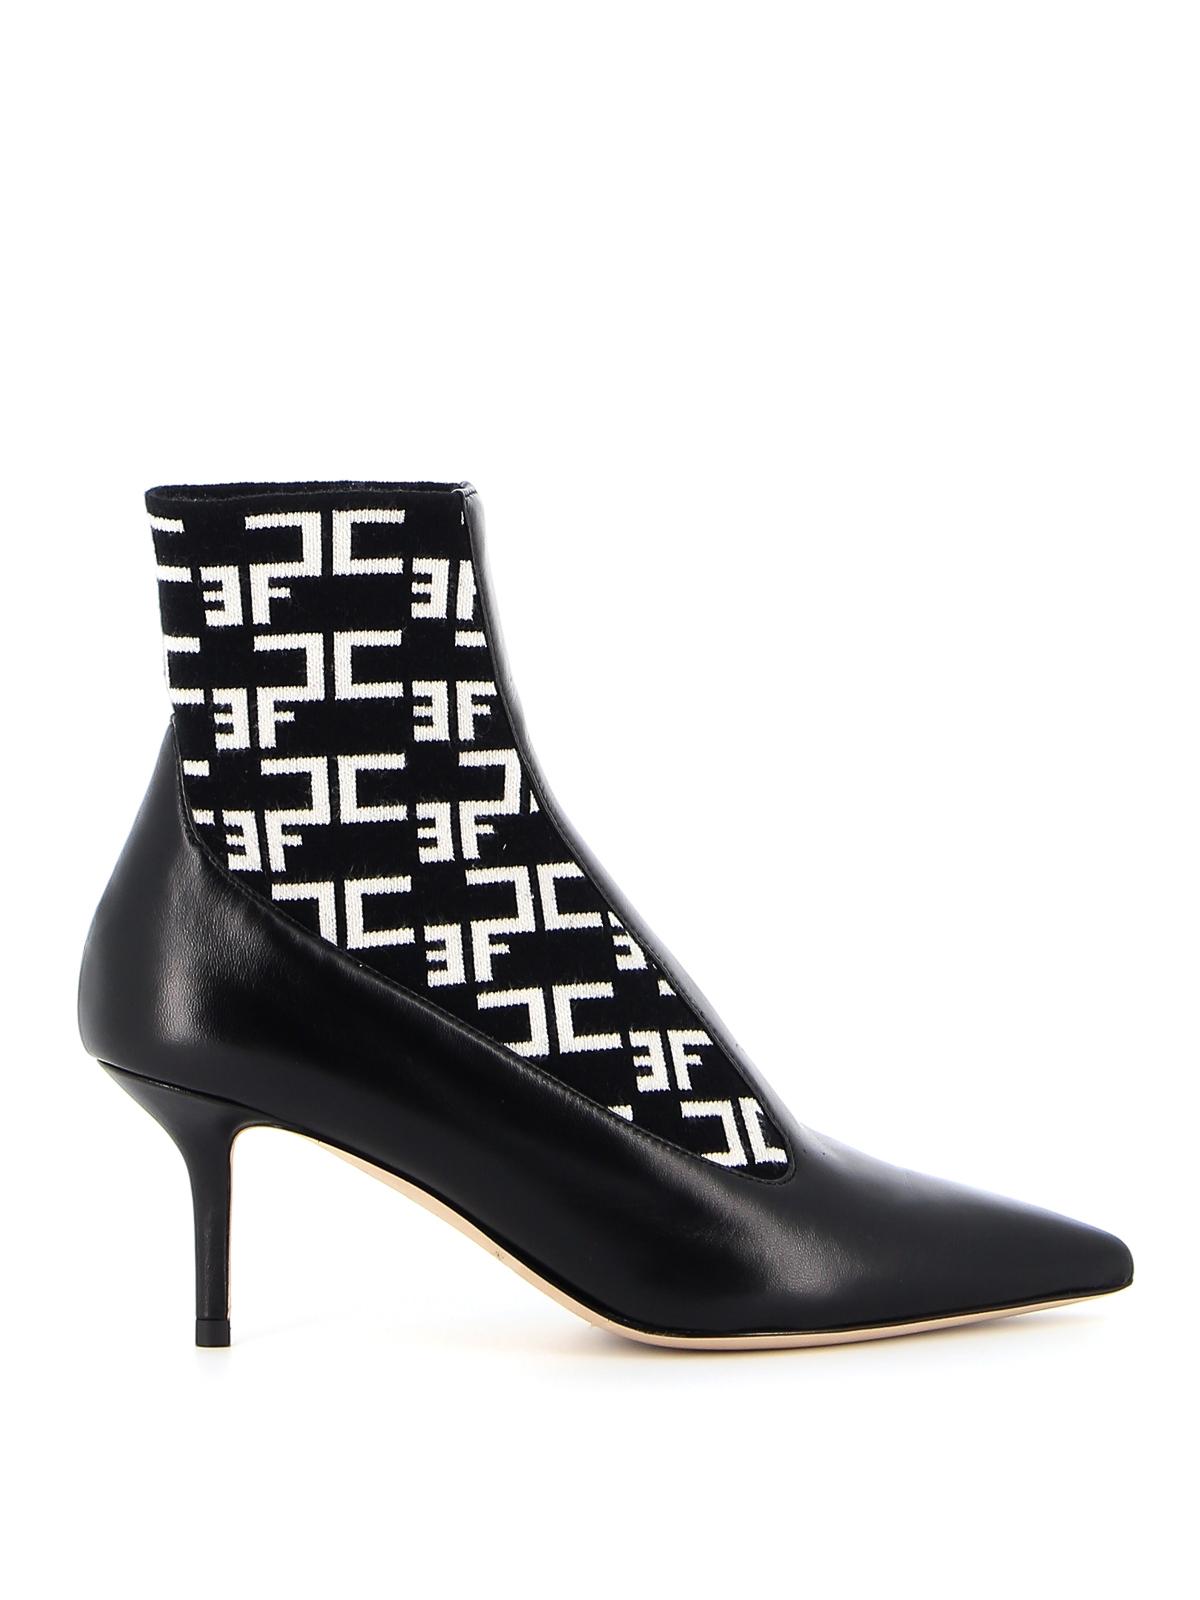 Elisabetta Franchi Leathers SOCK ANKLE BOOTS